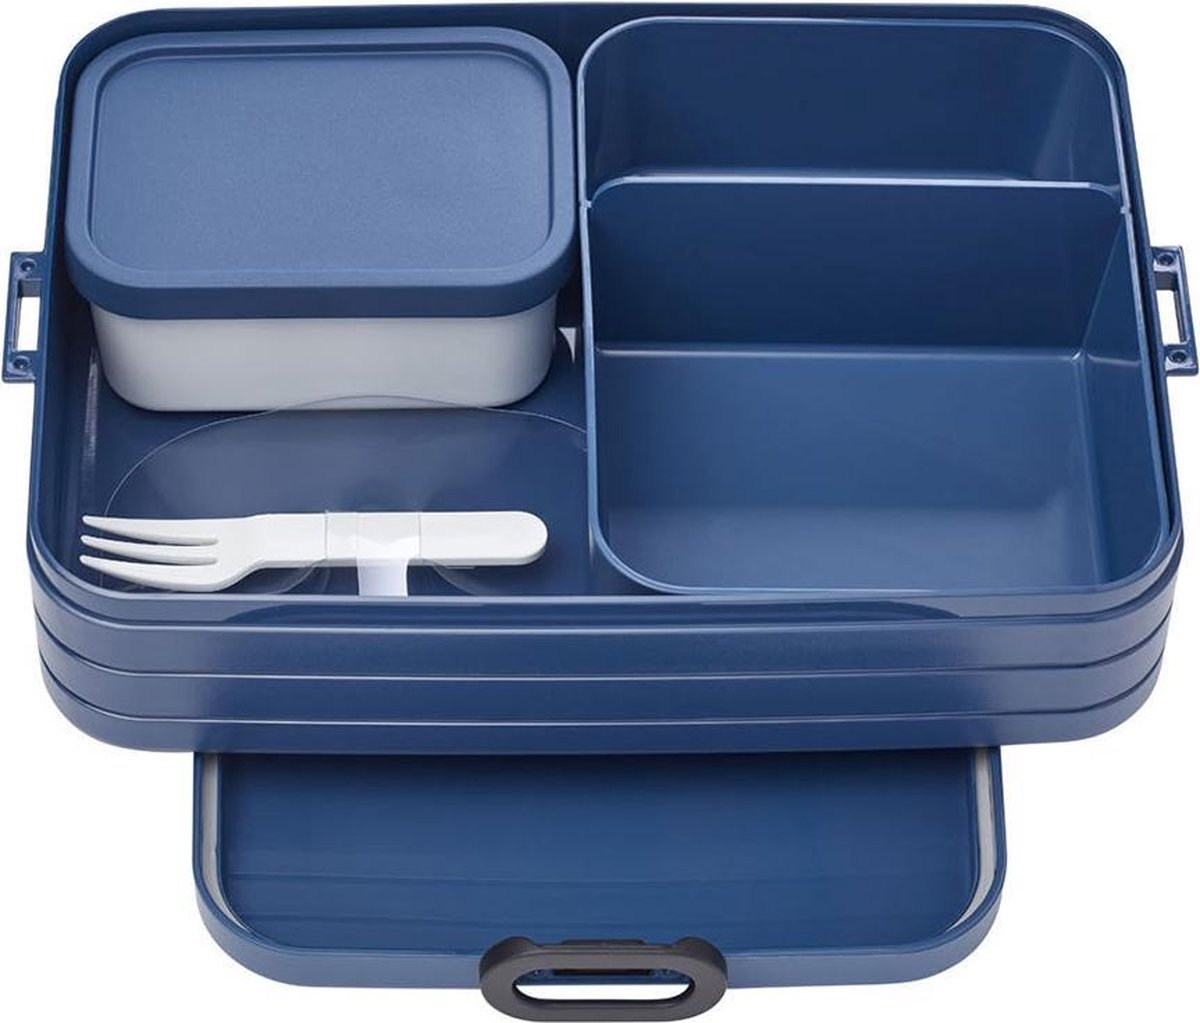 Mepal Bento Lunchbox Take a Break Large - Nordic Denim